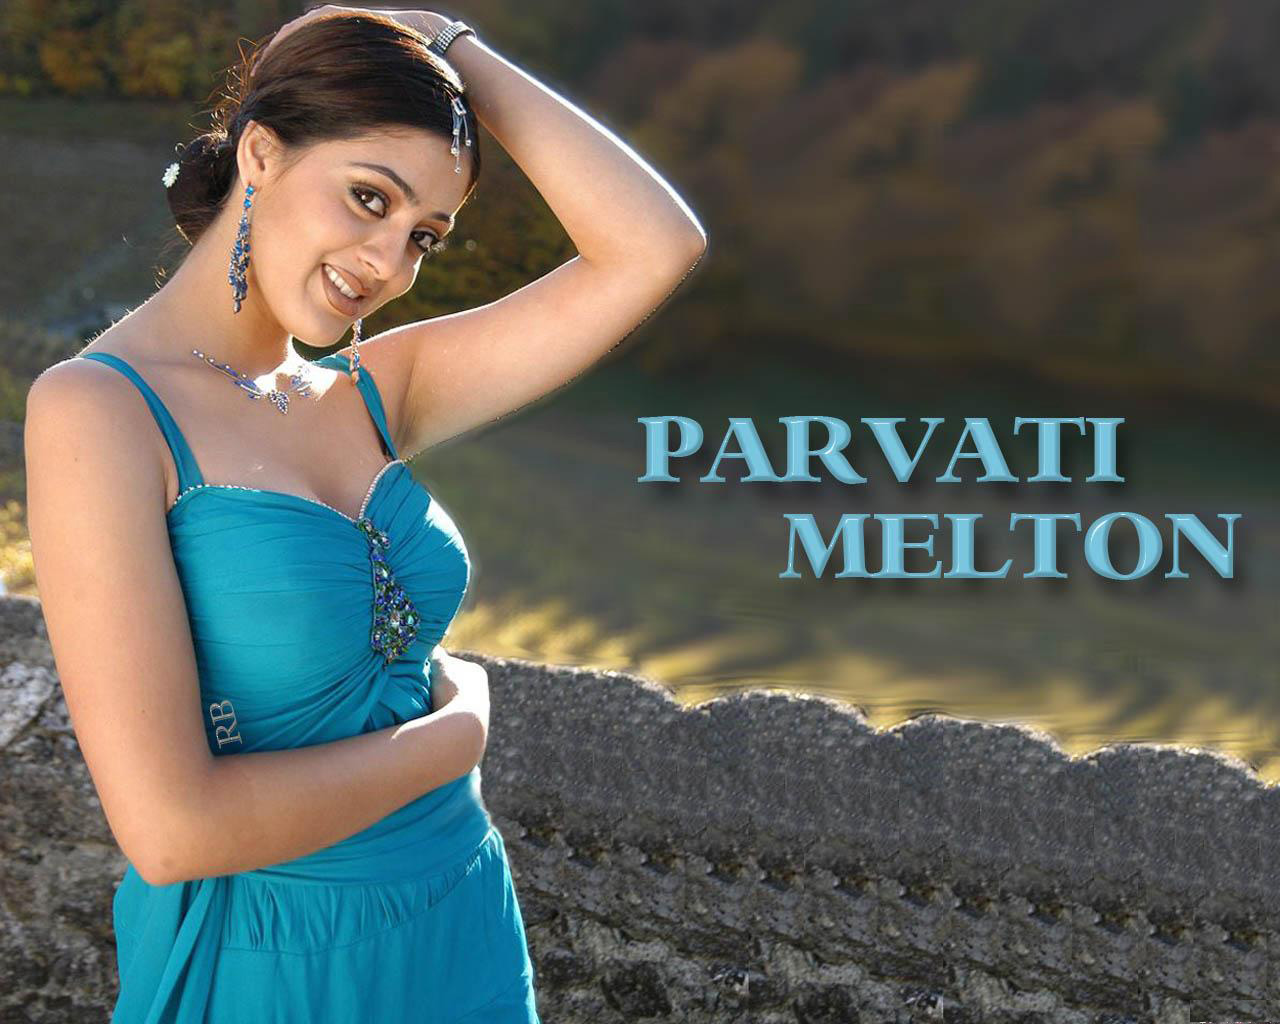 HQ Parvati Melton Wallpapers | File 241.17Kb